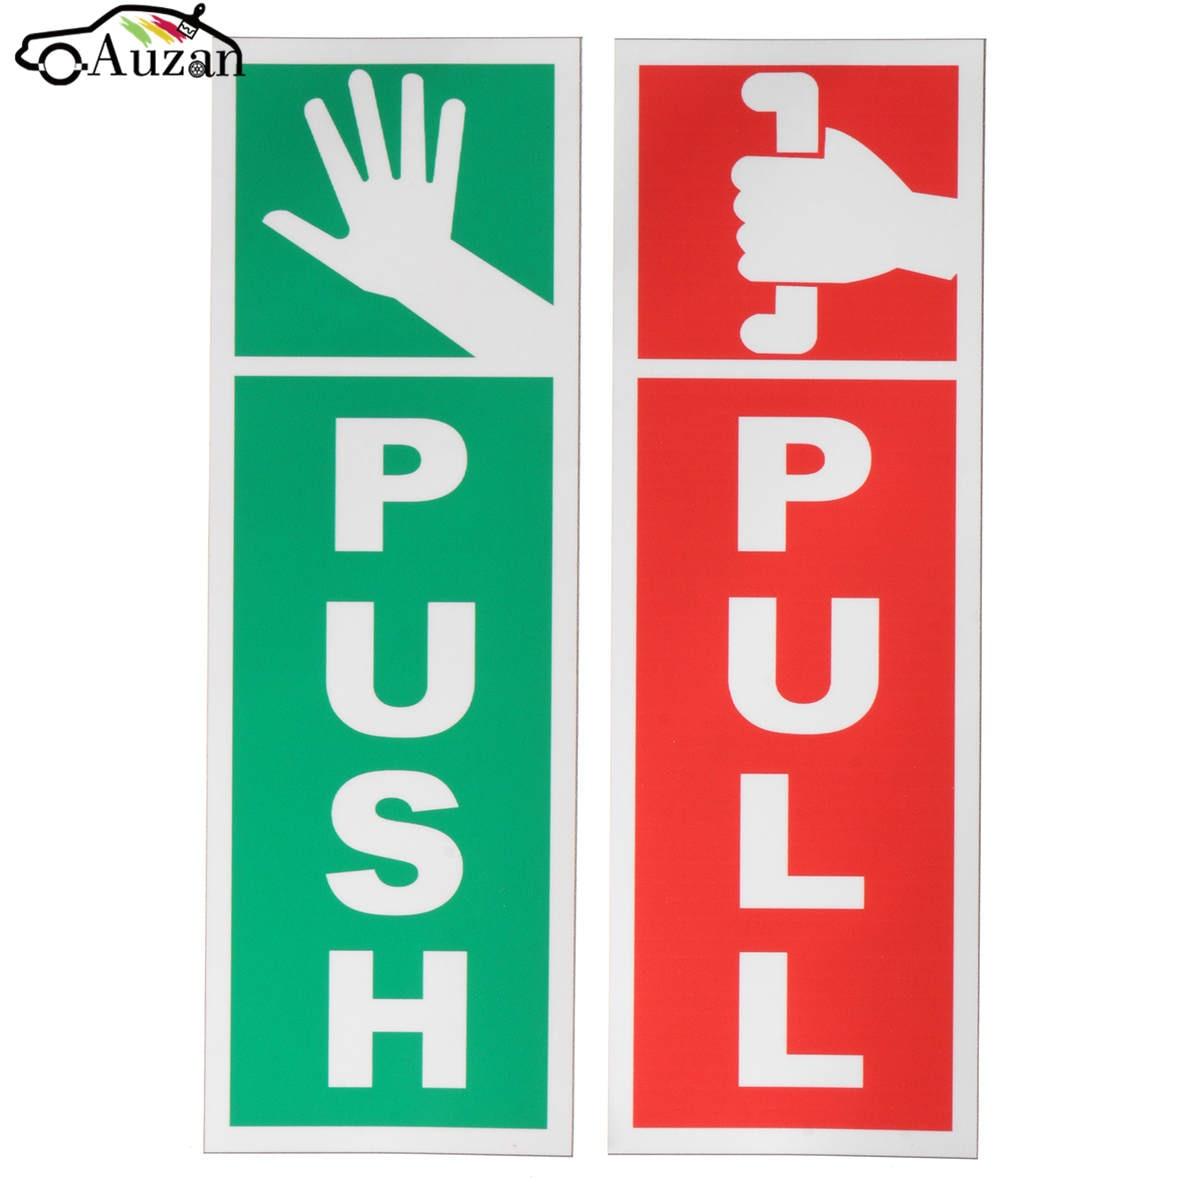 Push Amp Pull Door Window Gloss Laminated Warning Sign Vinyl